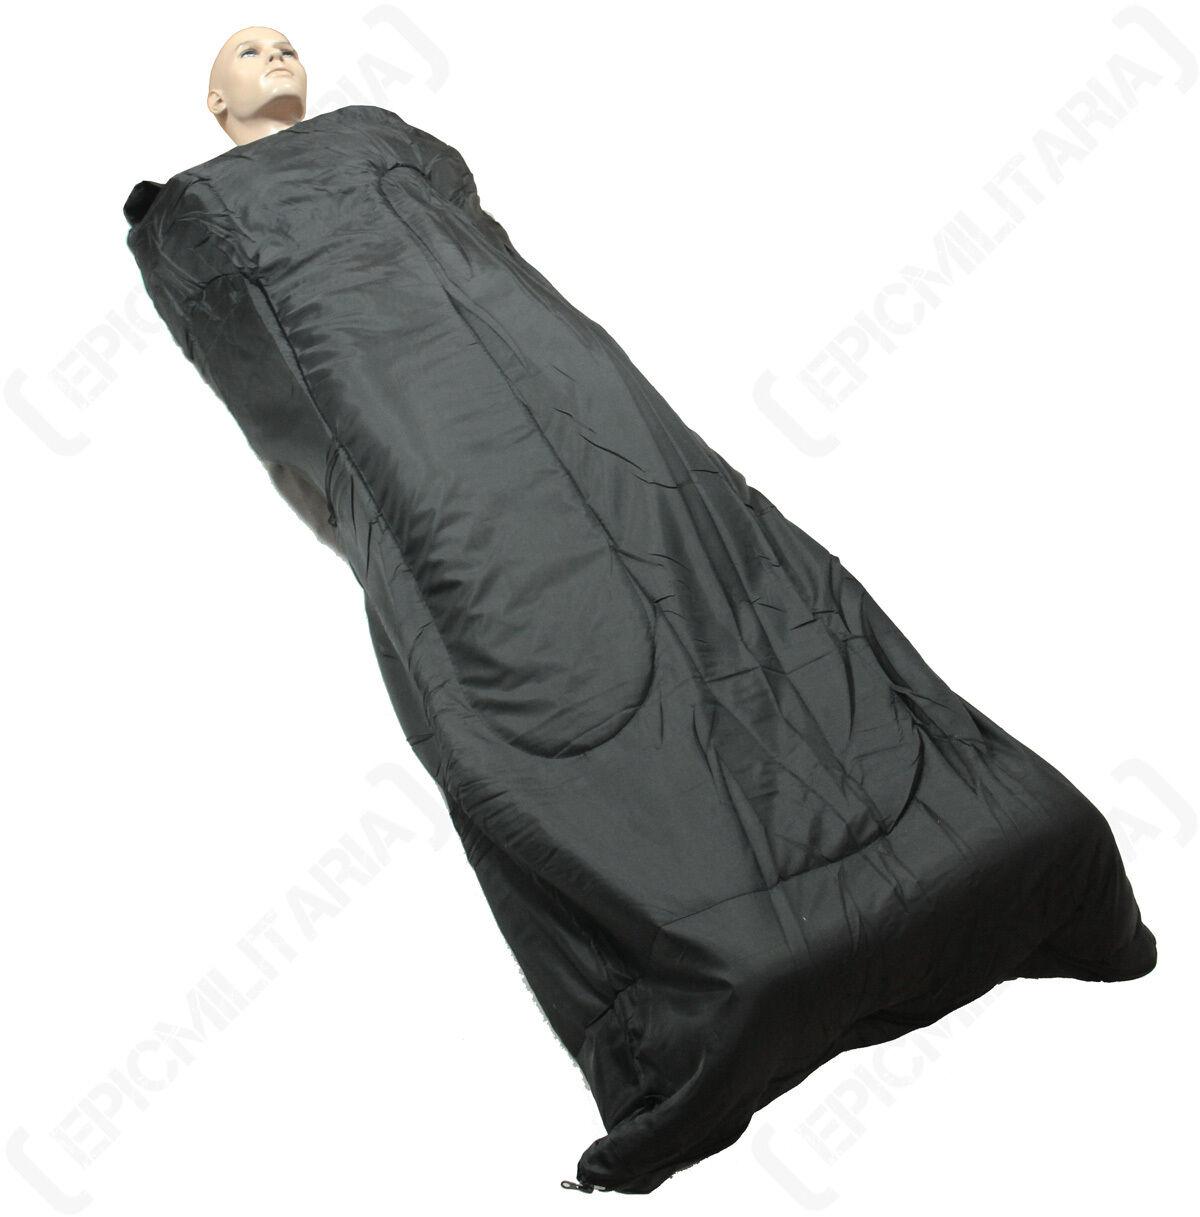 Noir pilote sac de couchage-système pack pack pack militaire camping festival cadet outdoor 7476bb